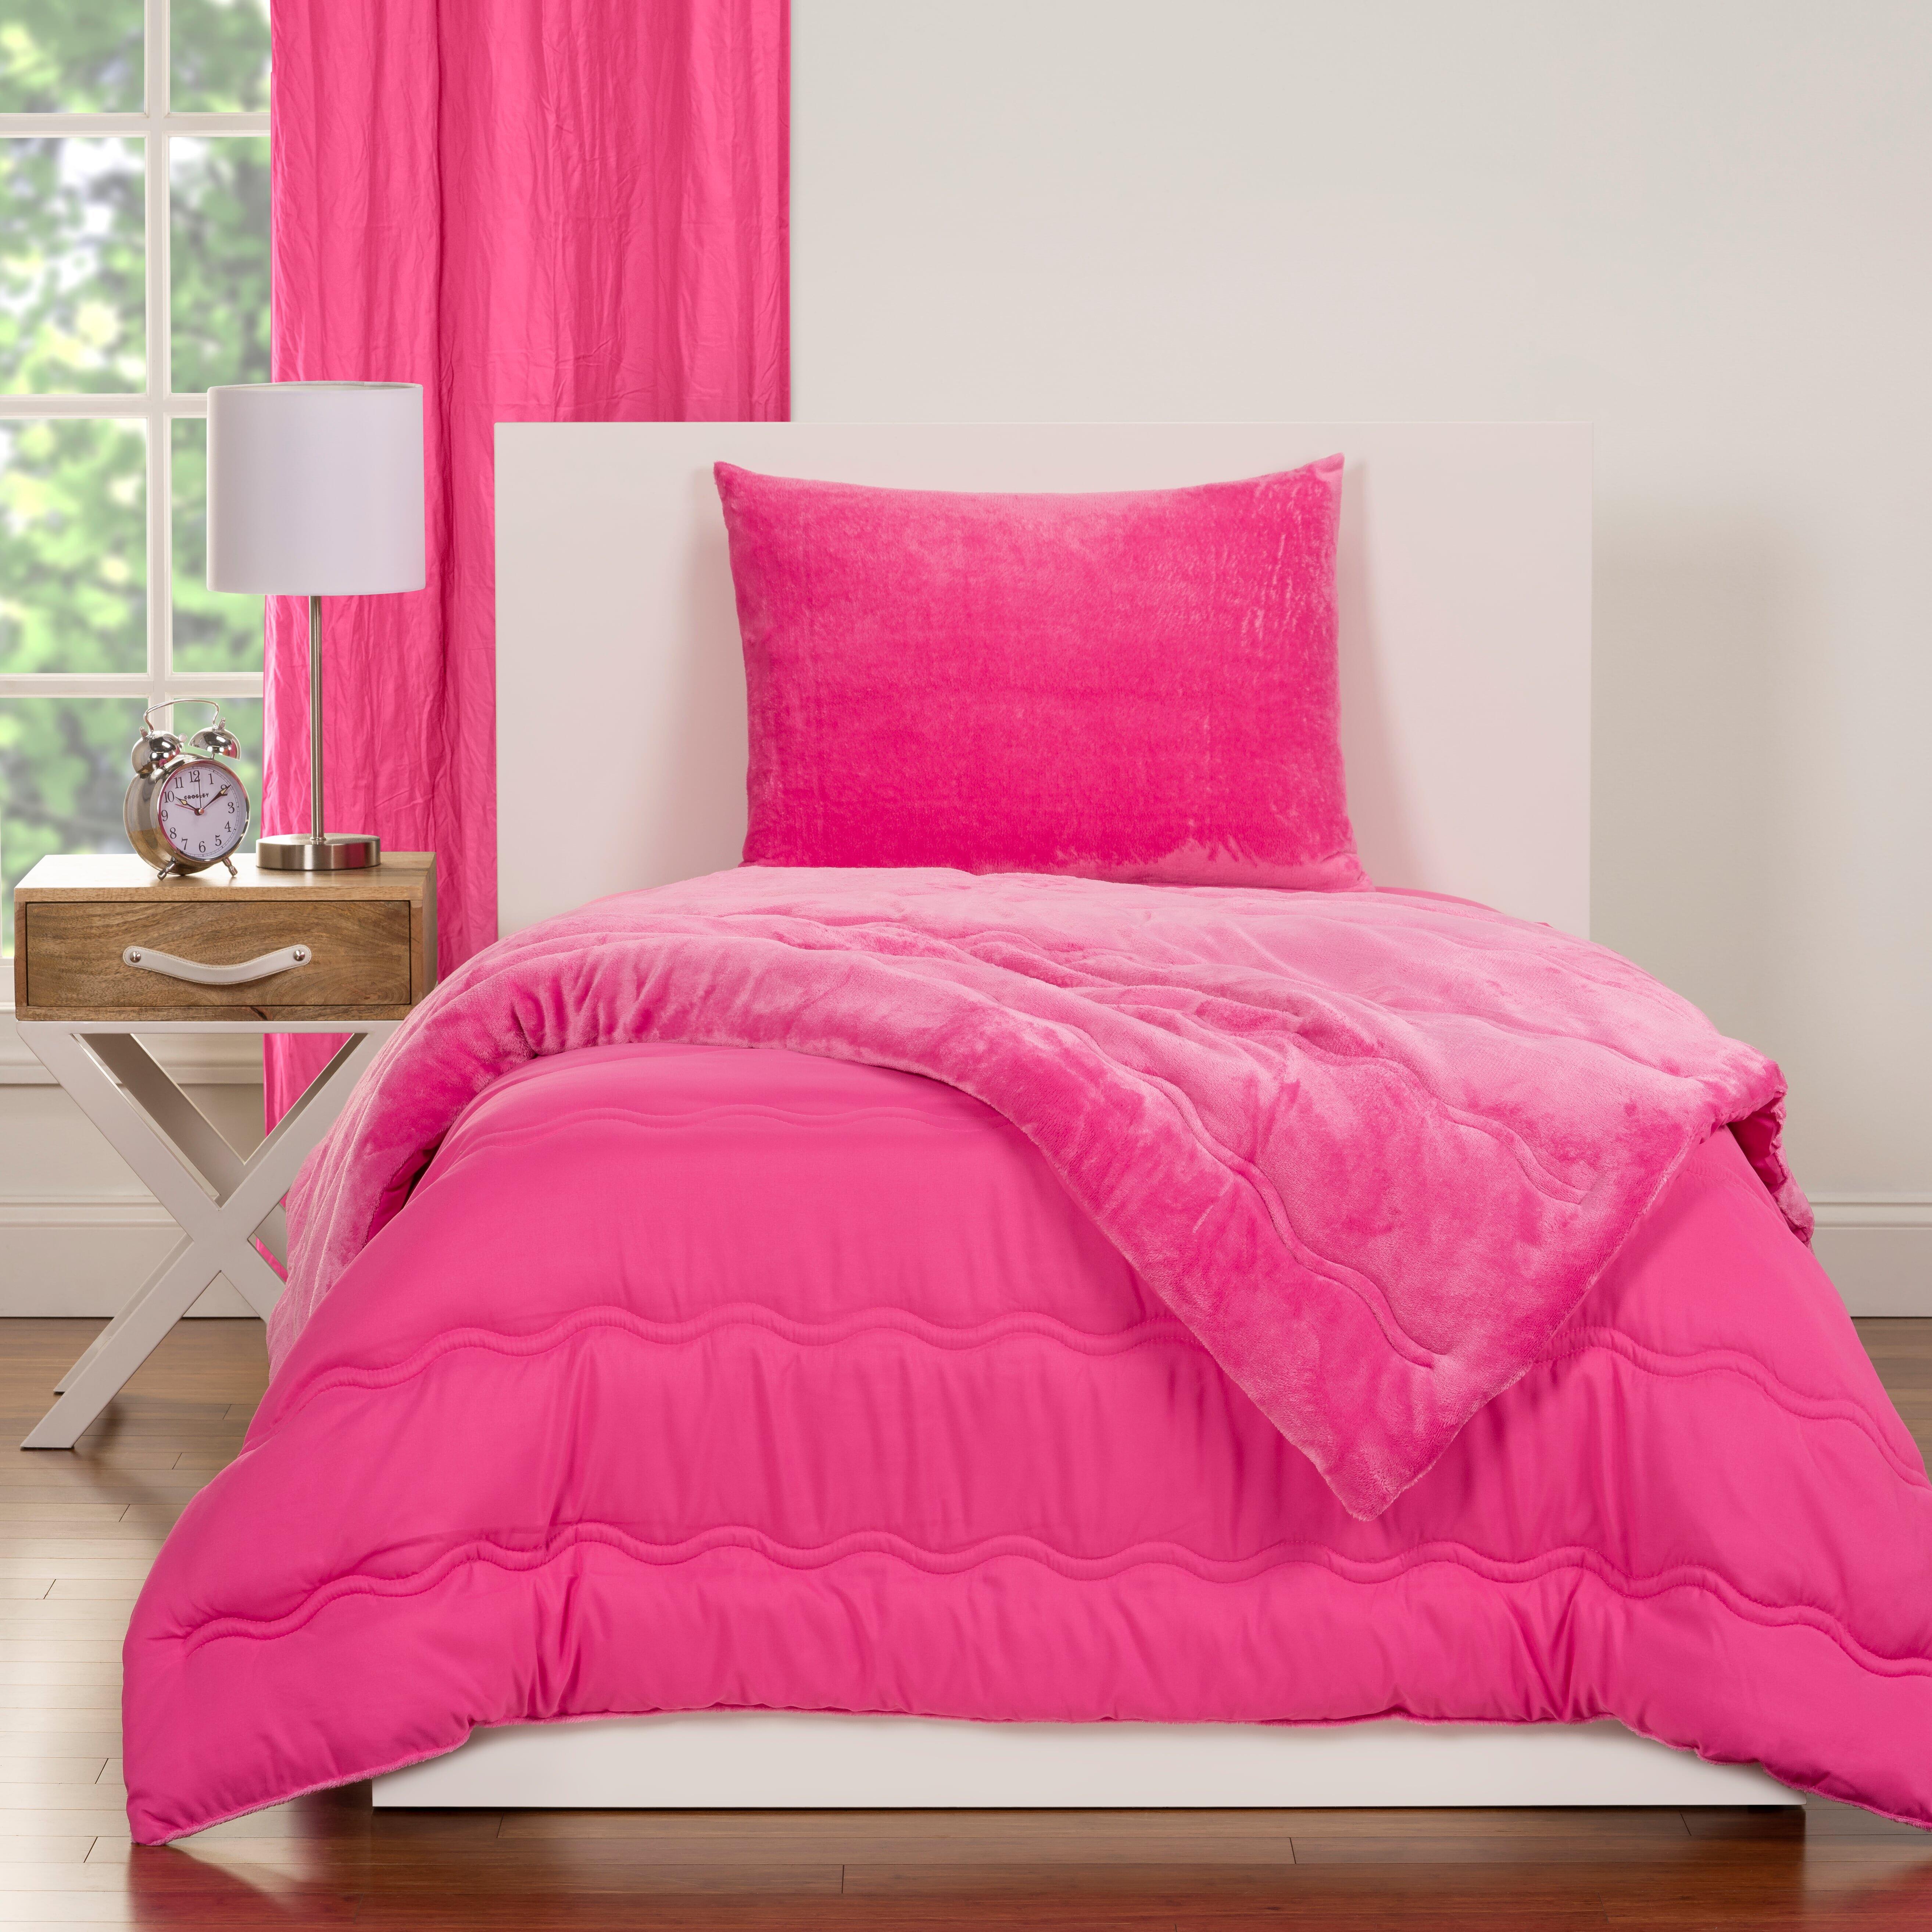 Wayfair Purple Comforters Sets You Ll Love In 2021